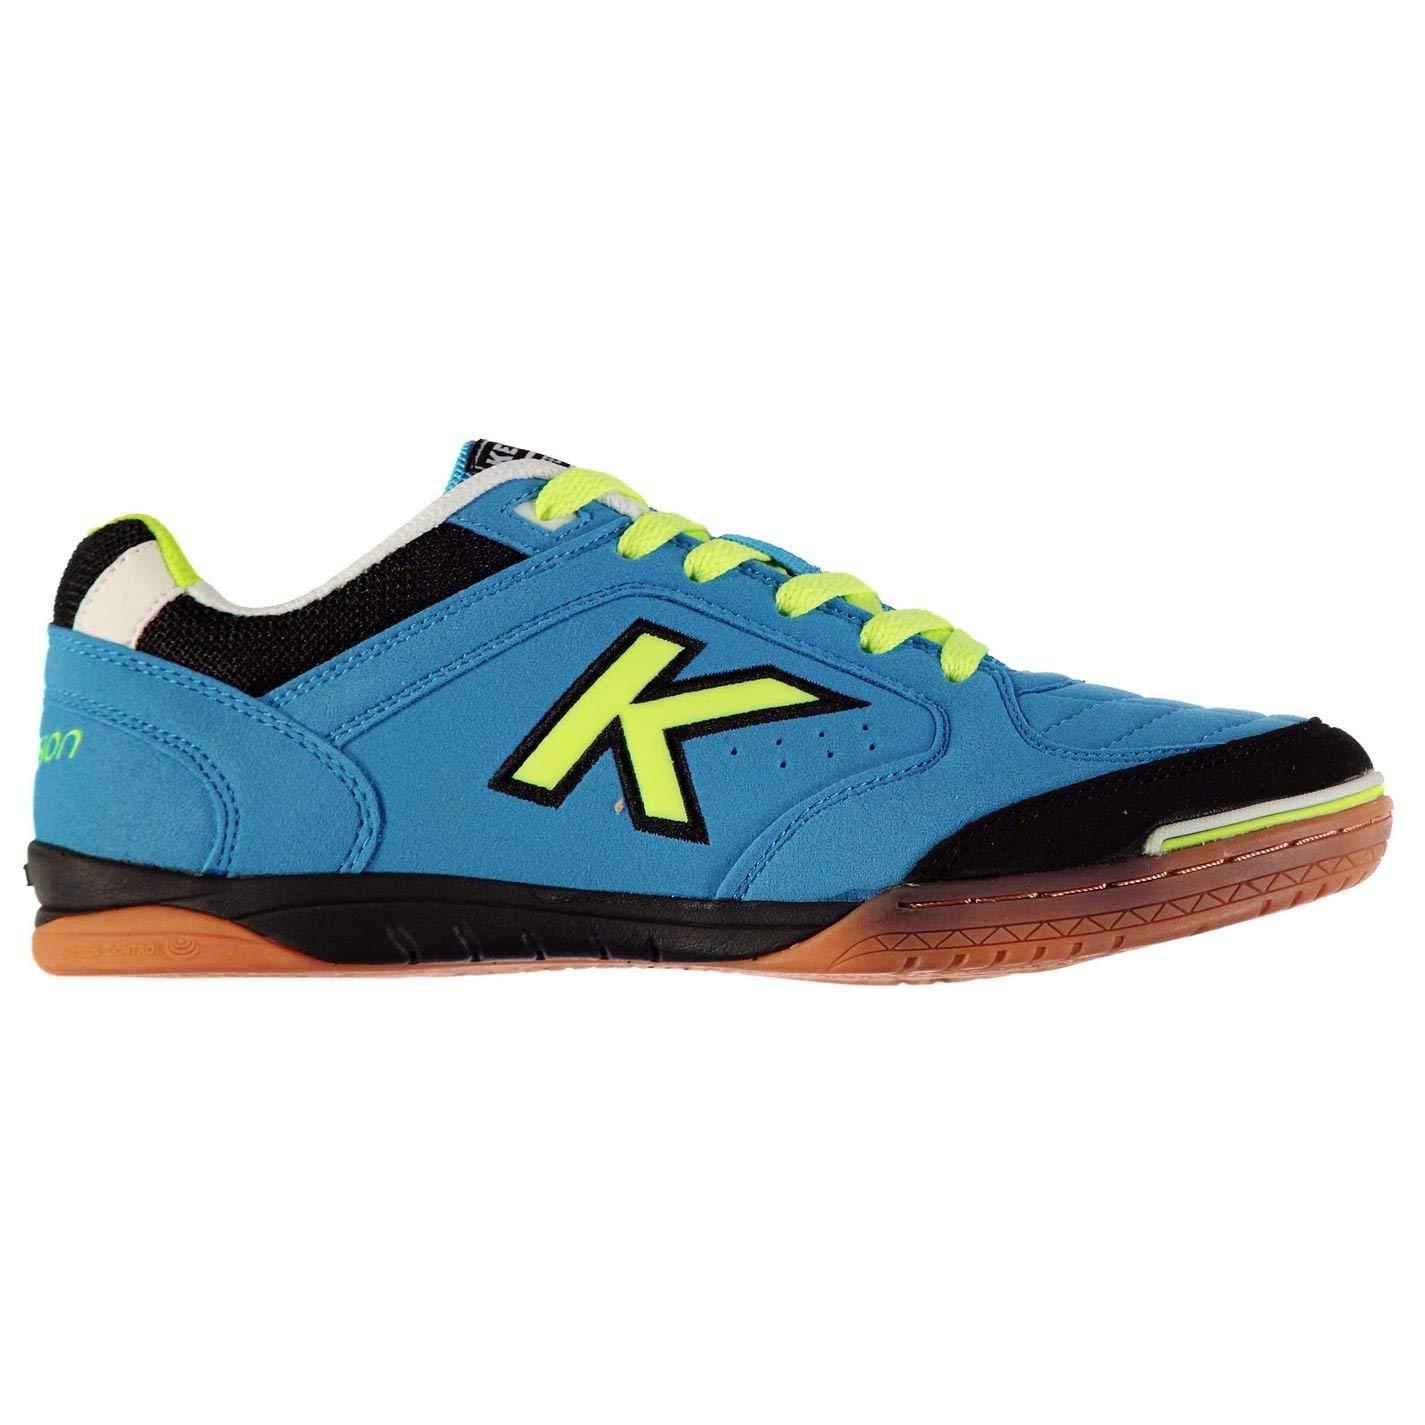 c04403d23 Get Quotations · KELME Mens Precision Indoor Court Trainers Football Shoes